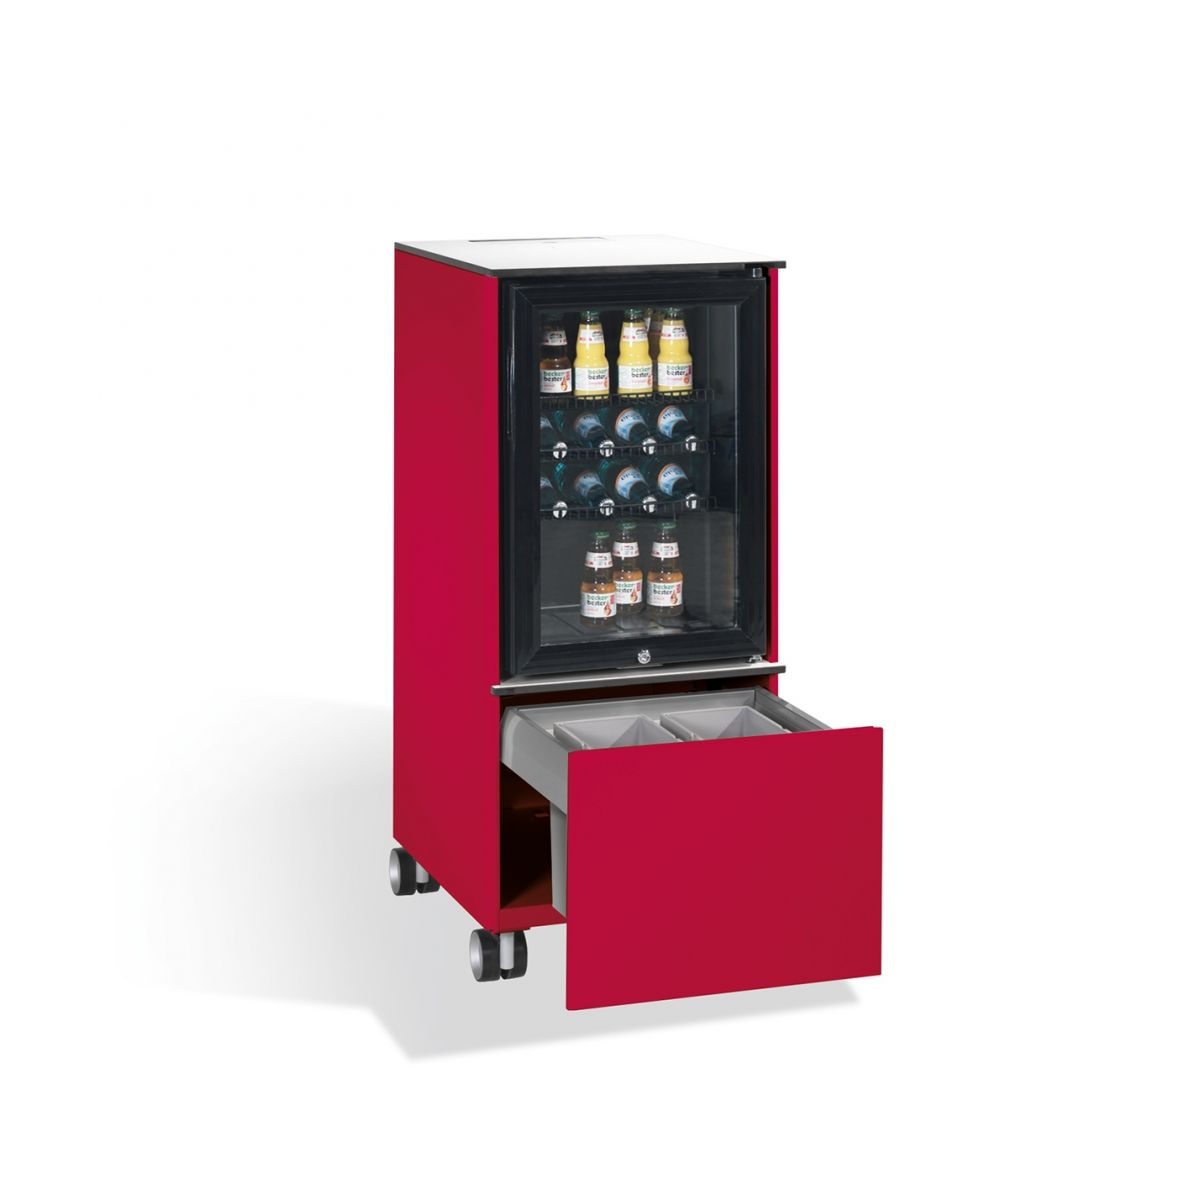 Kühlschrank Caddy mit Abfallsammler RAL 3003 rubinrot